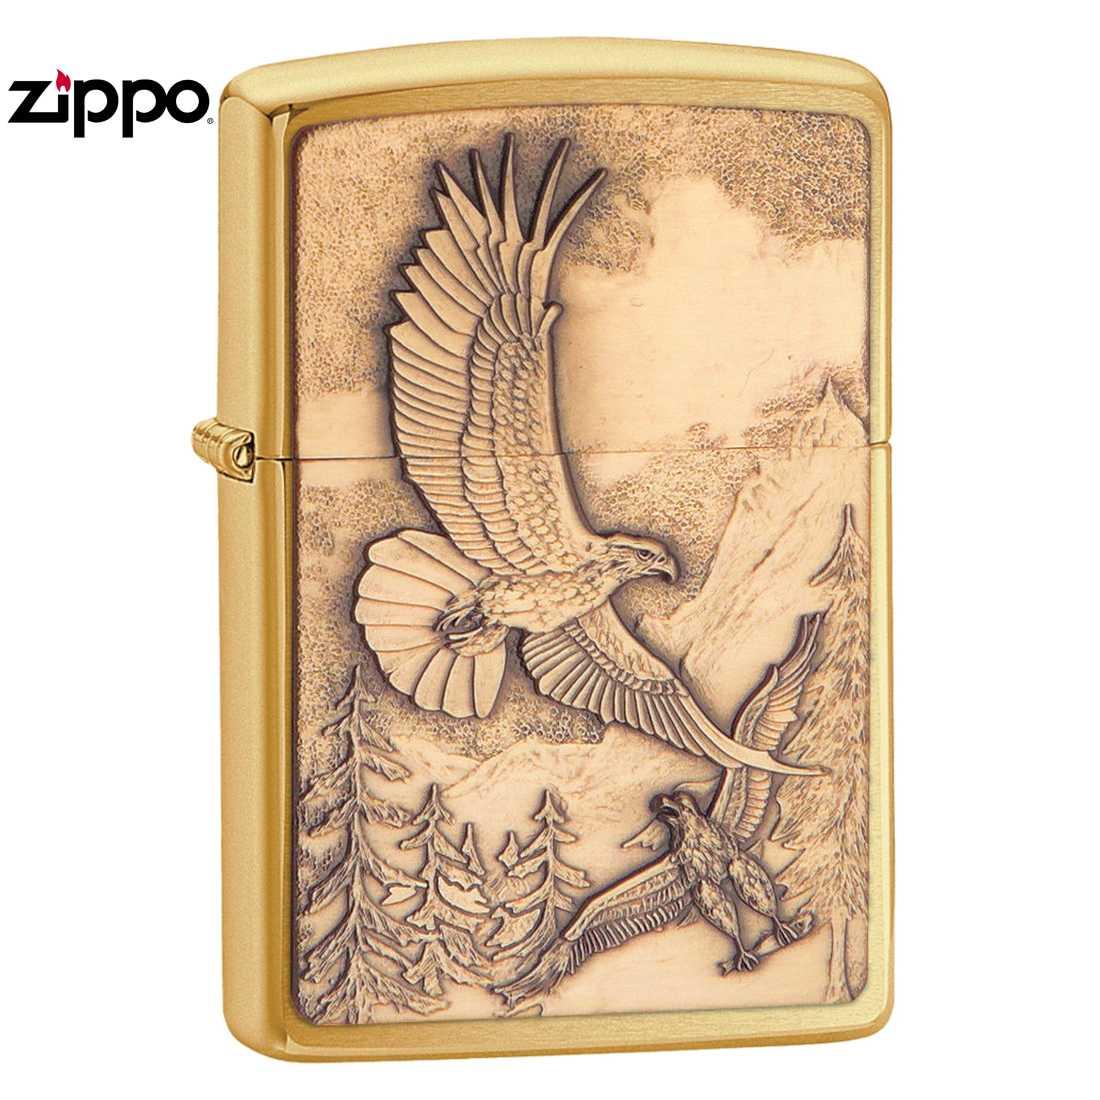 20854 ZIPPO Where Eagles Dare hawk Zippo oil writer toys, hobby game hobby,  collection smoking paraphernalia (Zippo pipe, ashtray) Zippo (ZIPPO)